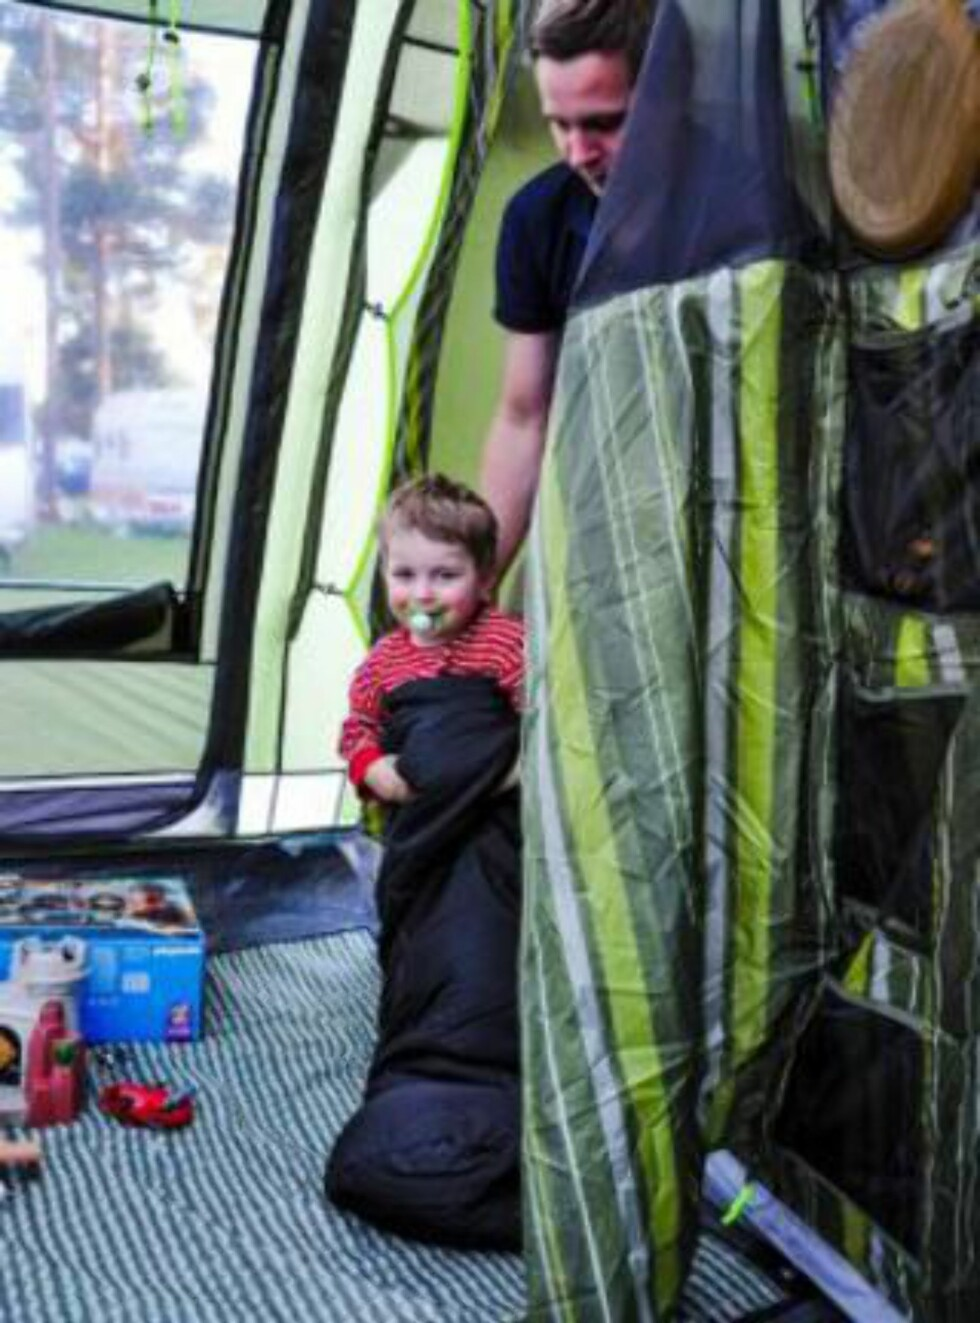 ERFAREN CAMPER: Fire år gamle August drar gjerne på luksus-camping igjen. Foto: PRIVAT